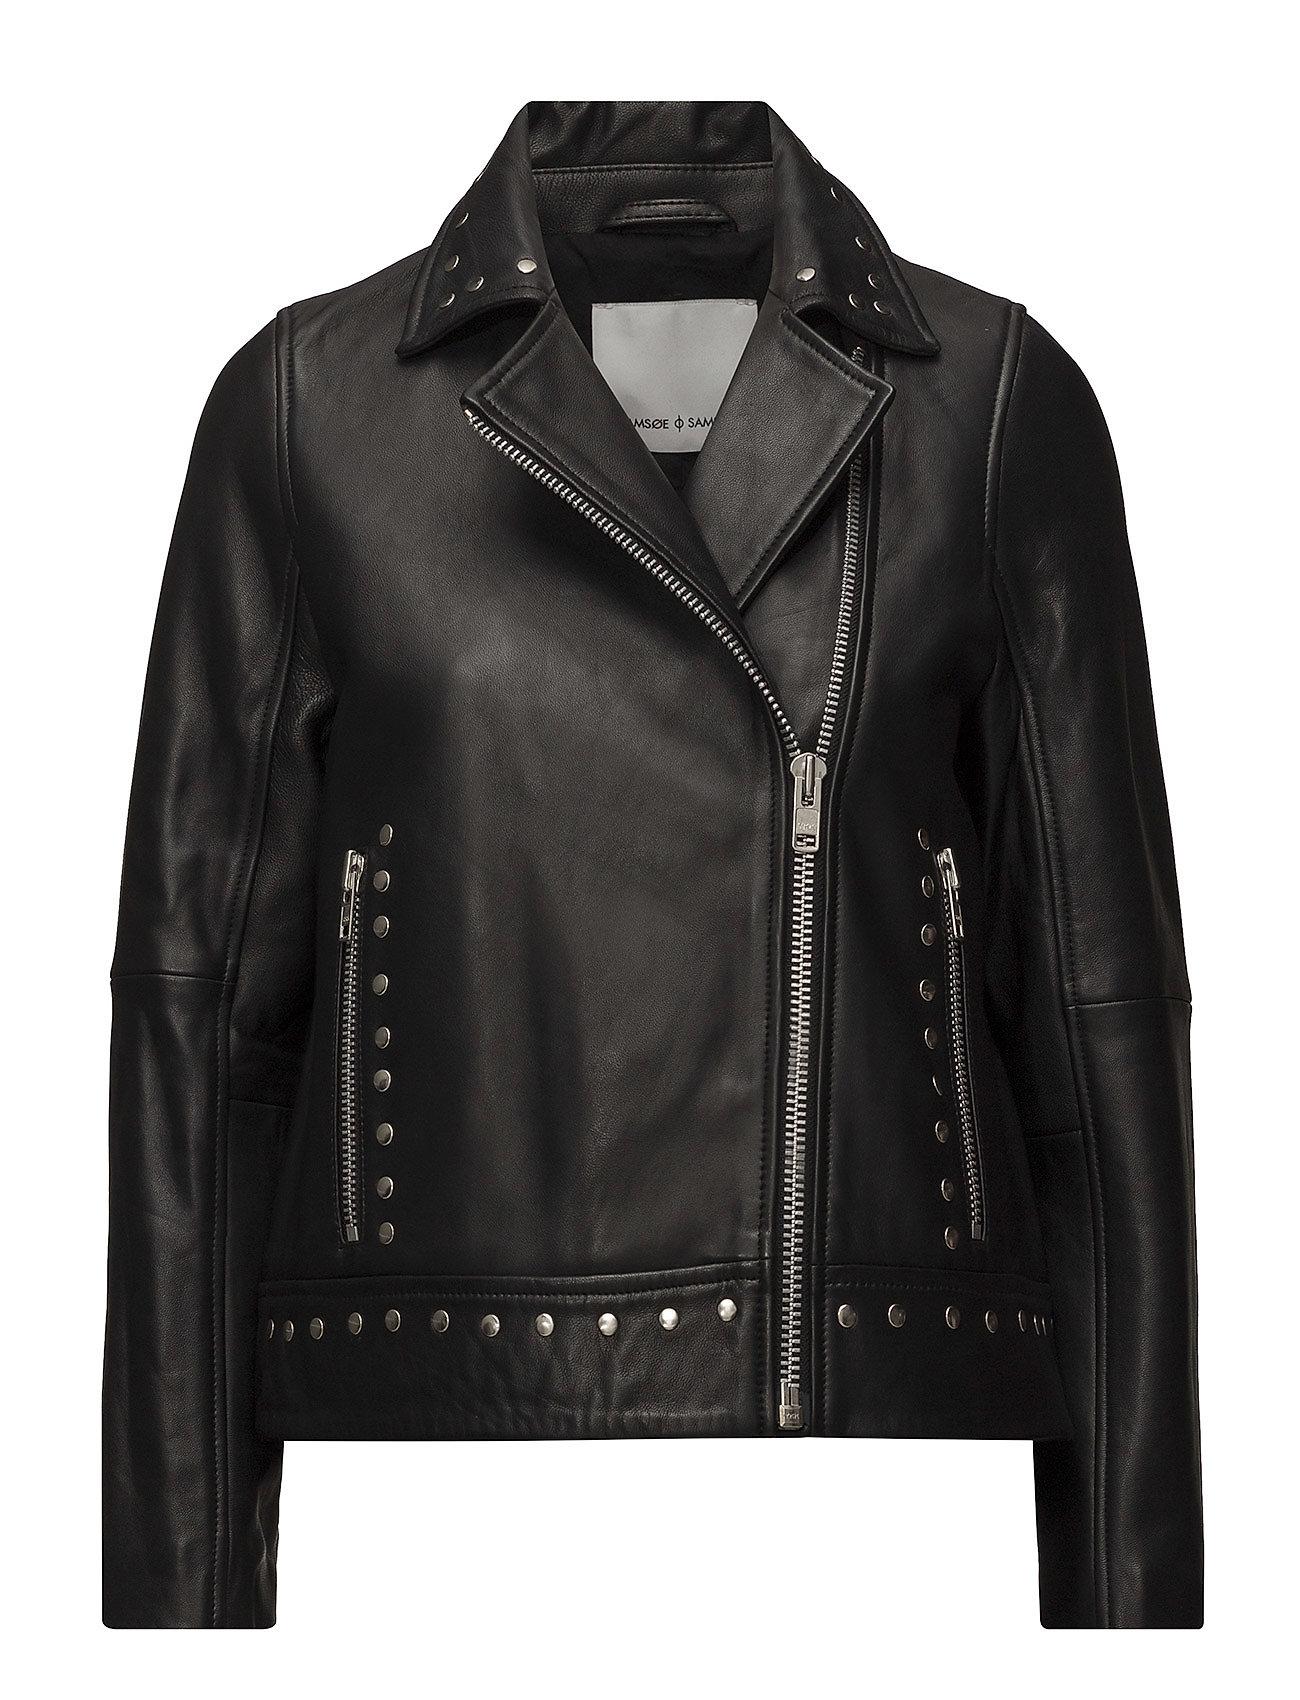 Collard Jacket 7501